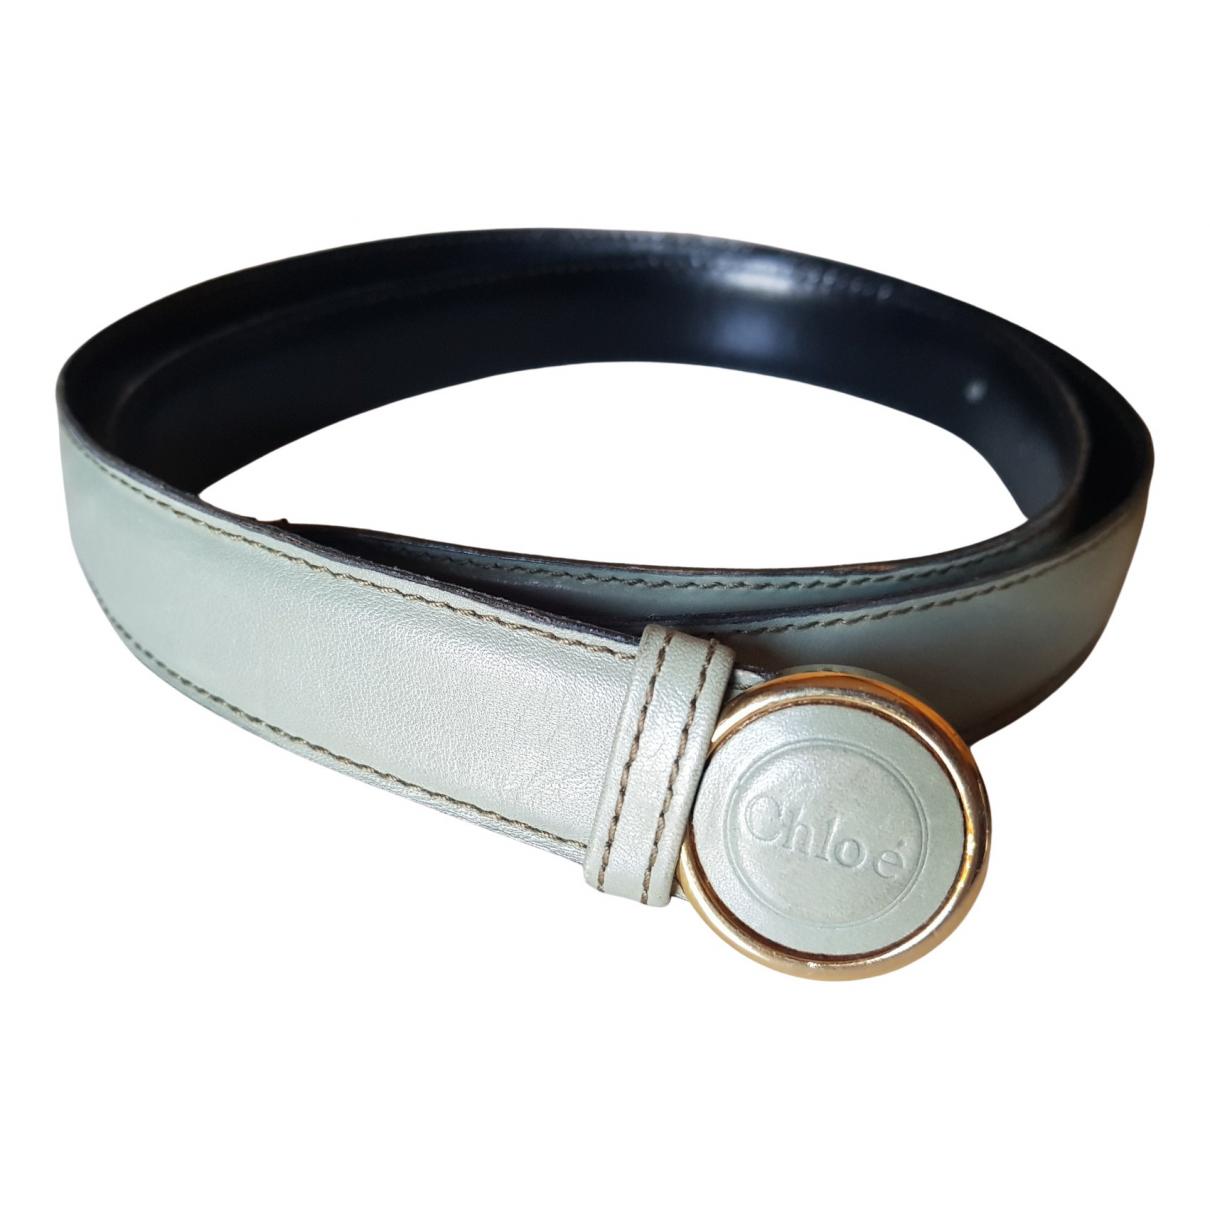 Chloé \N Grey Leather belt for Women M International